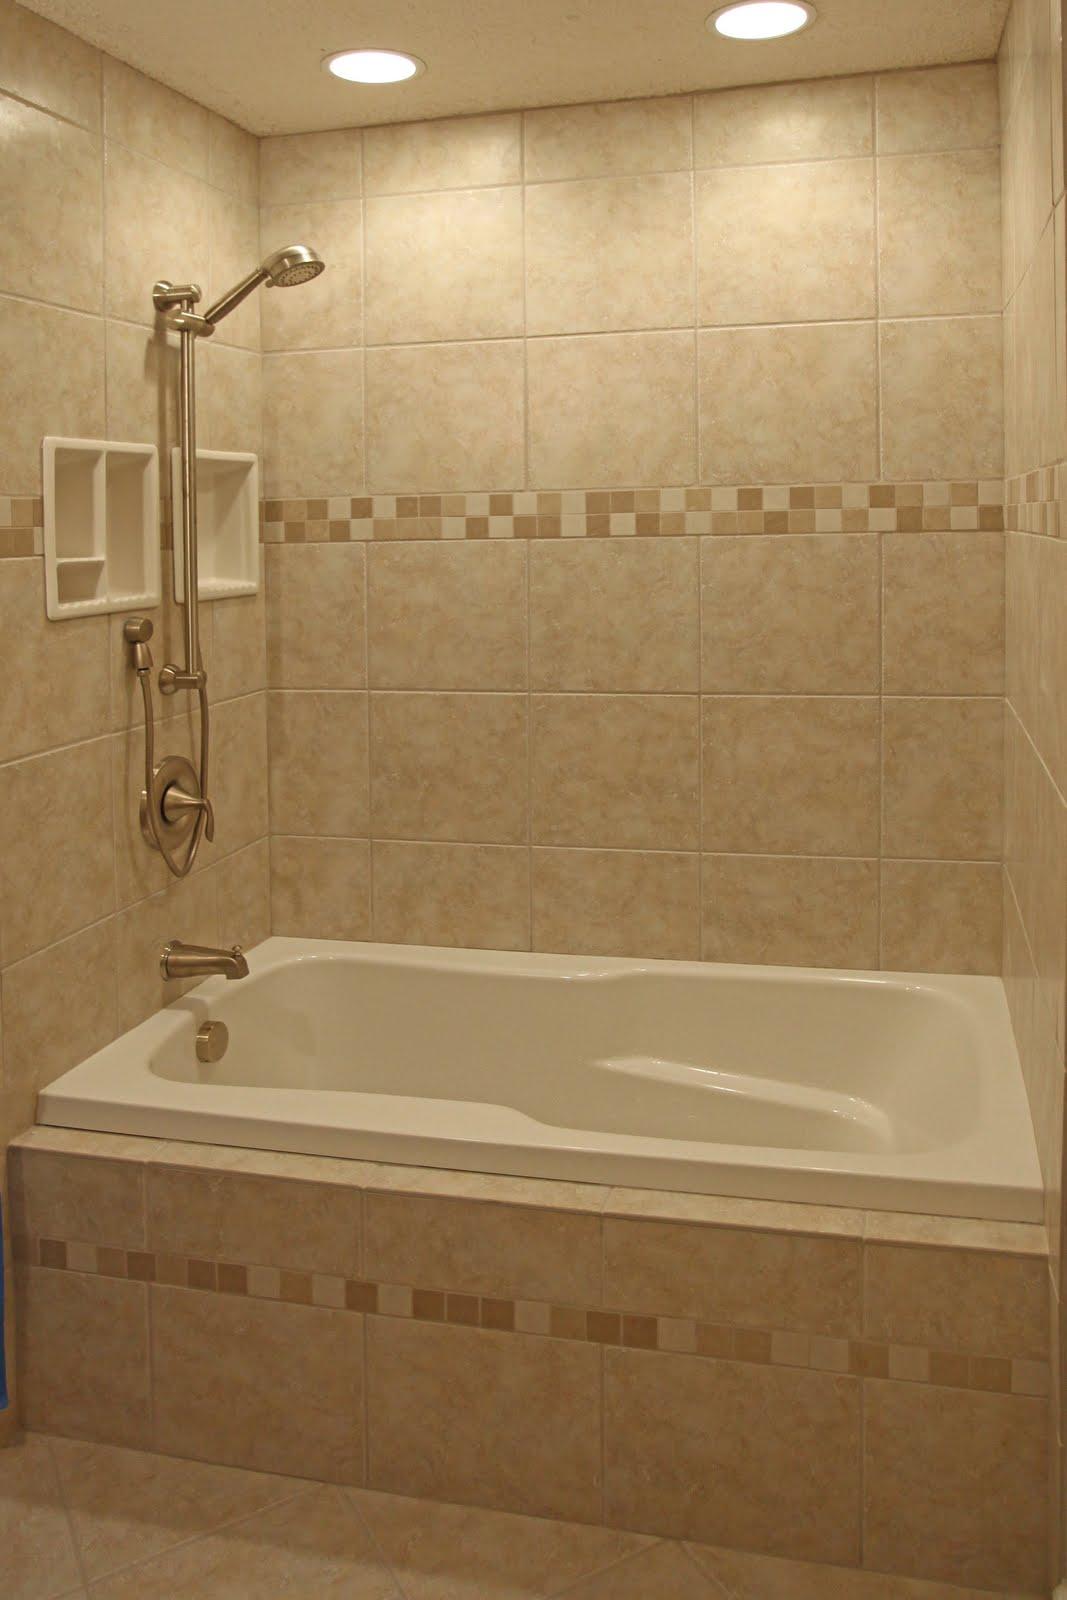 Best Kitchen Gallery: Wall Tile Bathrooms Ideas Pictures Of Bathroom Walls With Tile of Bathroom Wall Tile Ideas on rachelxblog.com